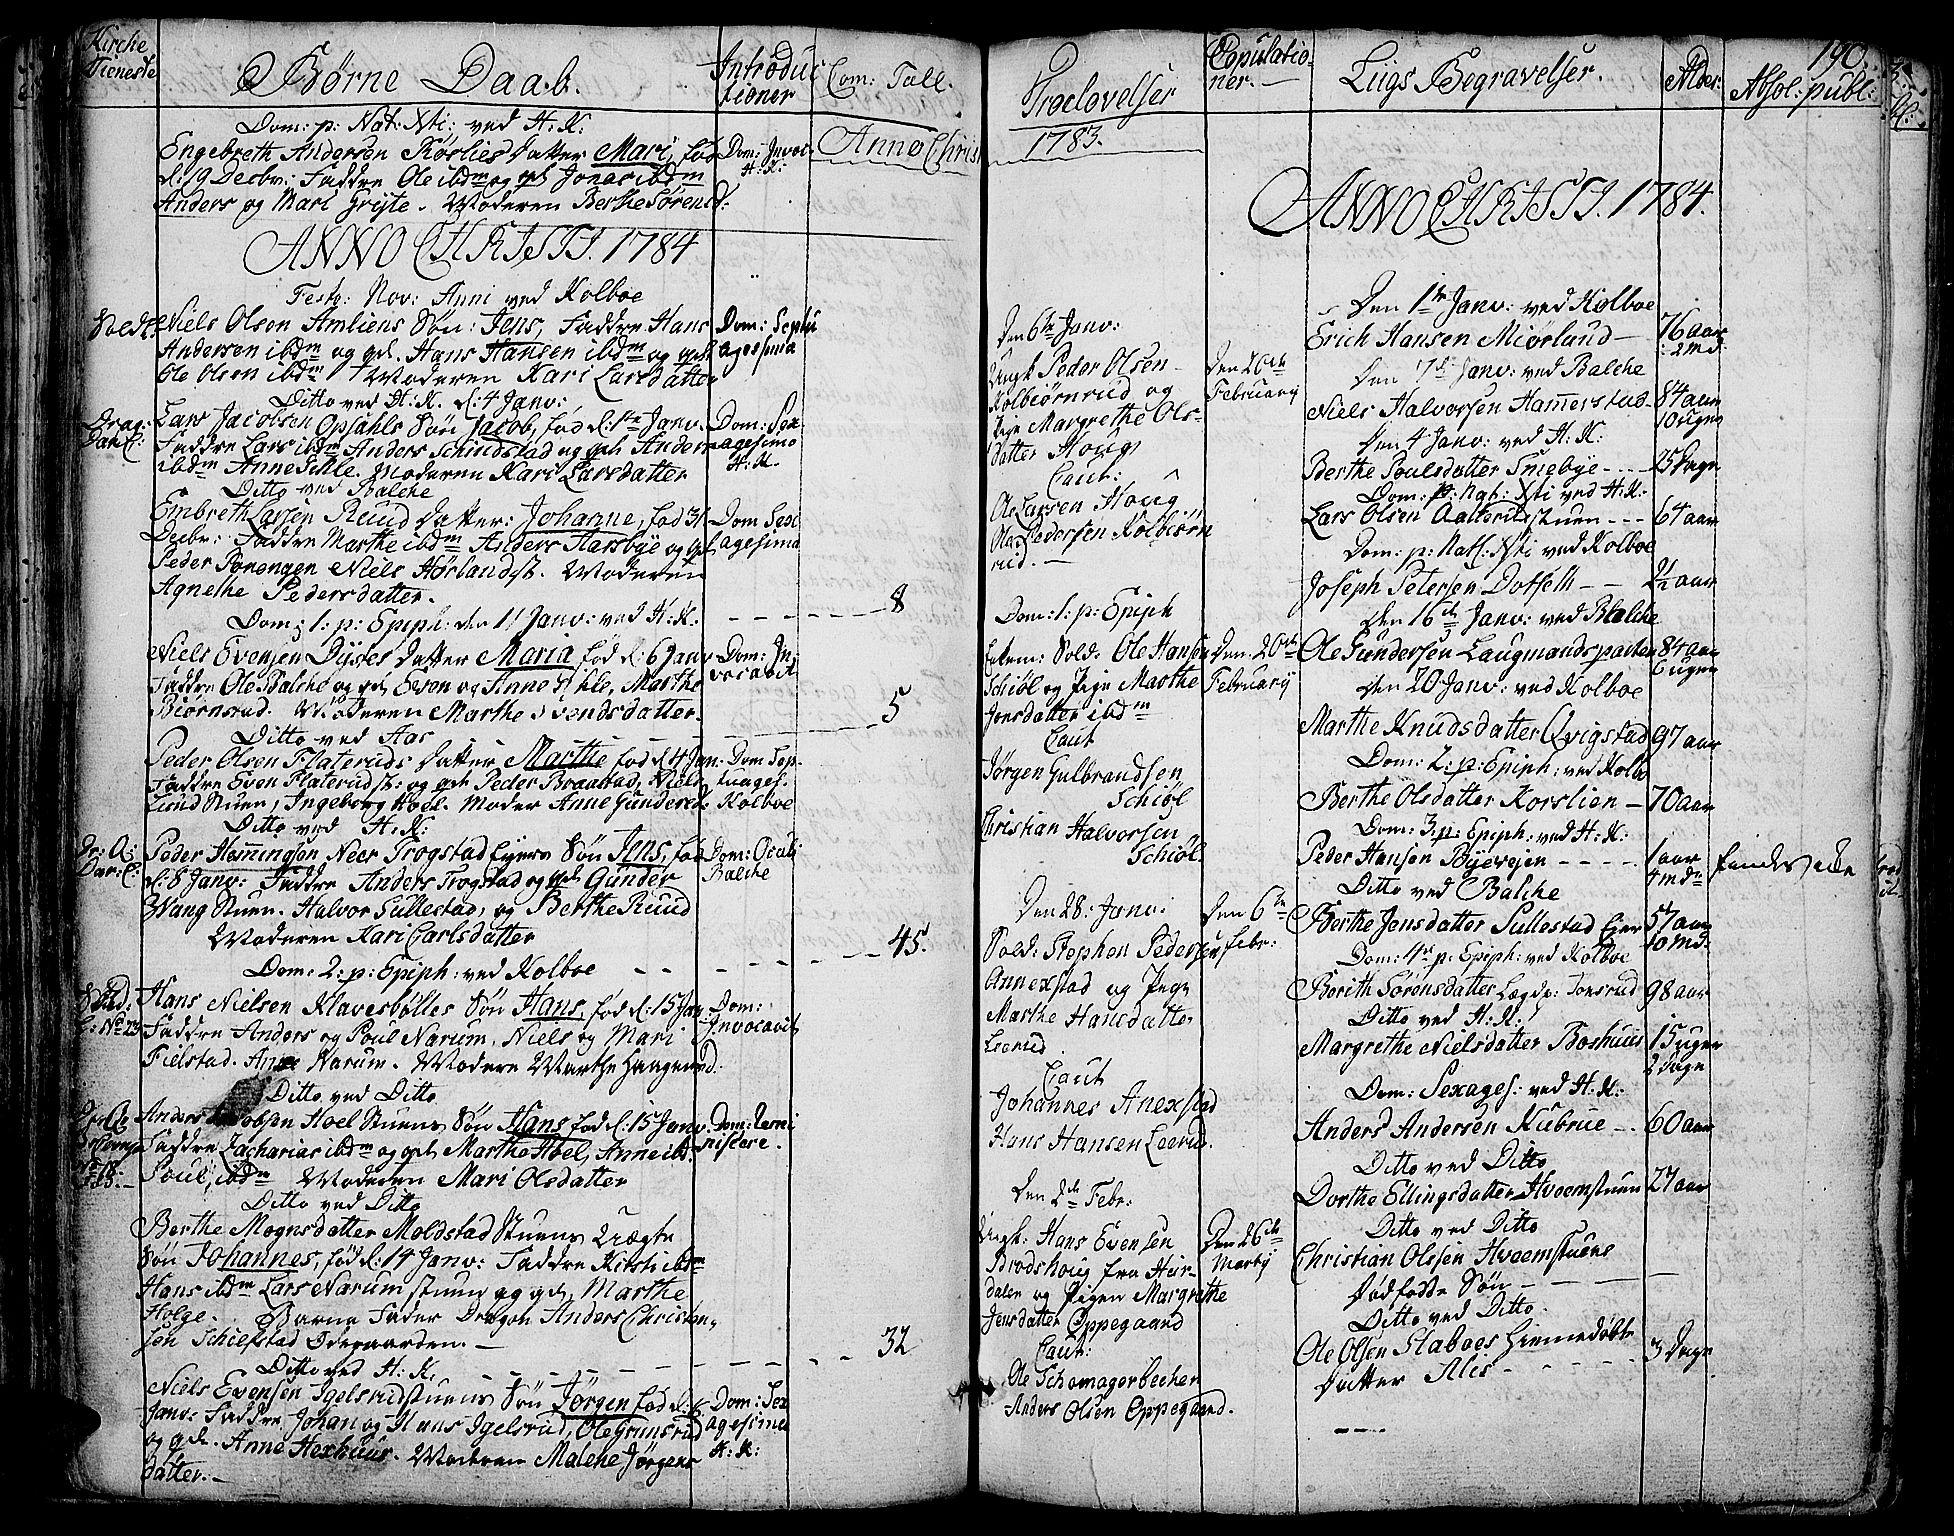 SAH, Toten prestekontor, Ministerialbok nr. 6, 1773-1793, s. 190